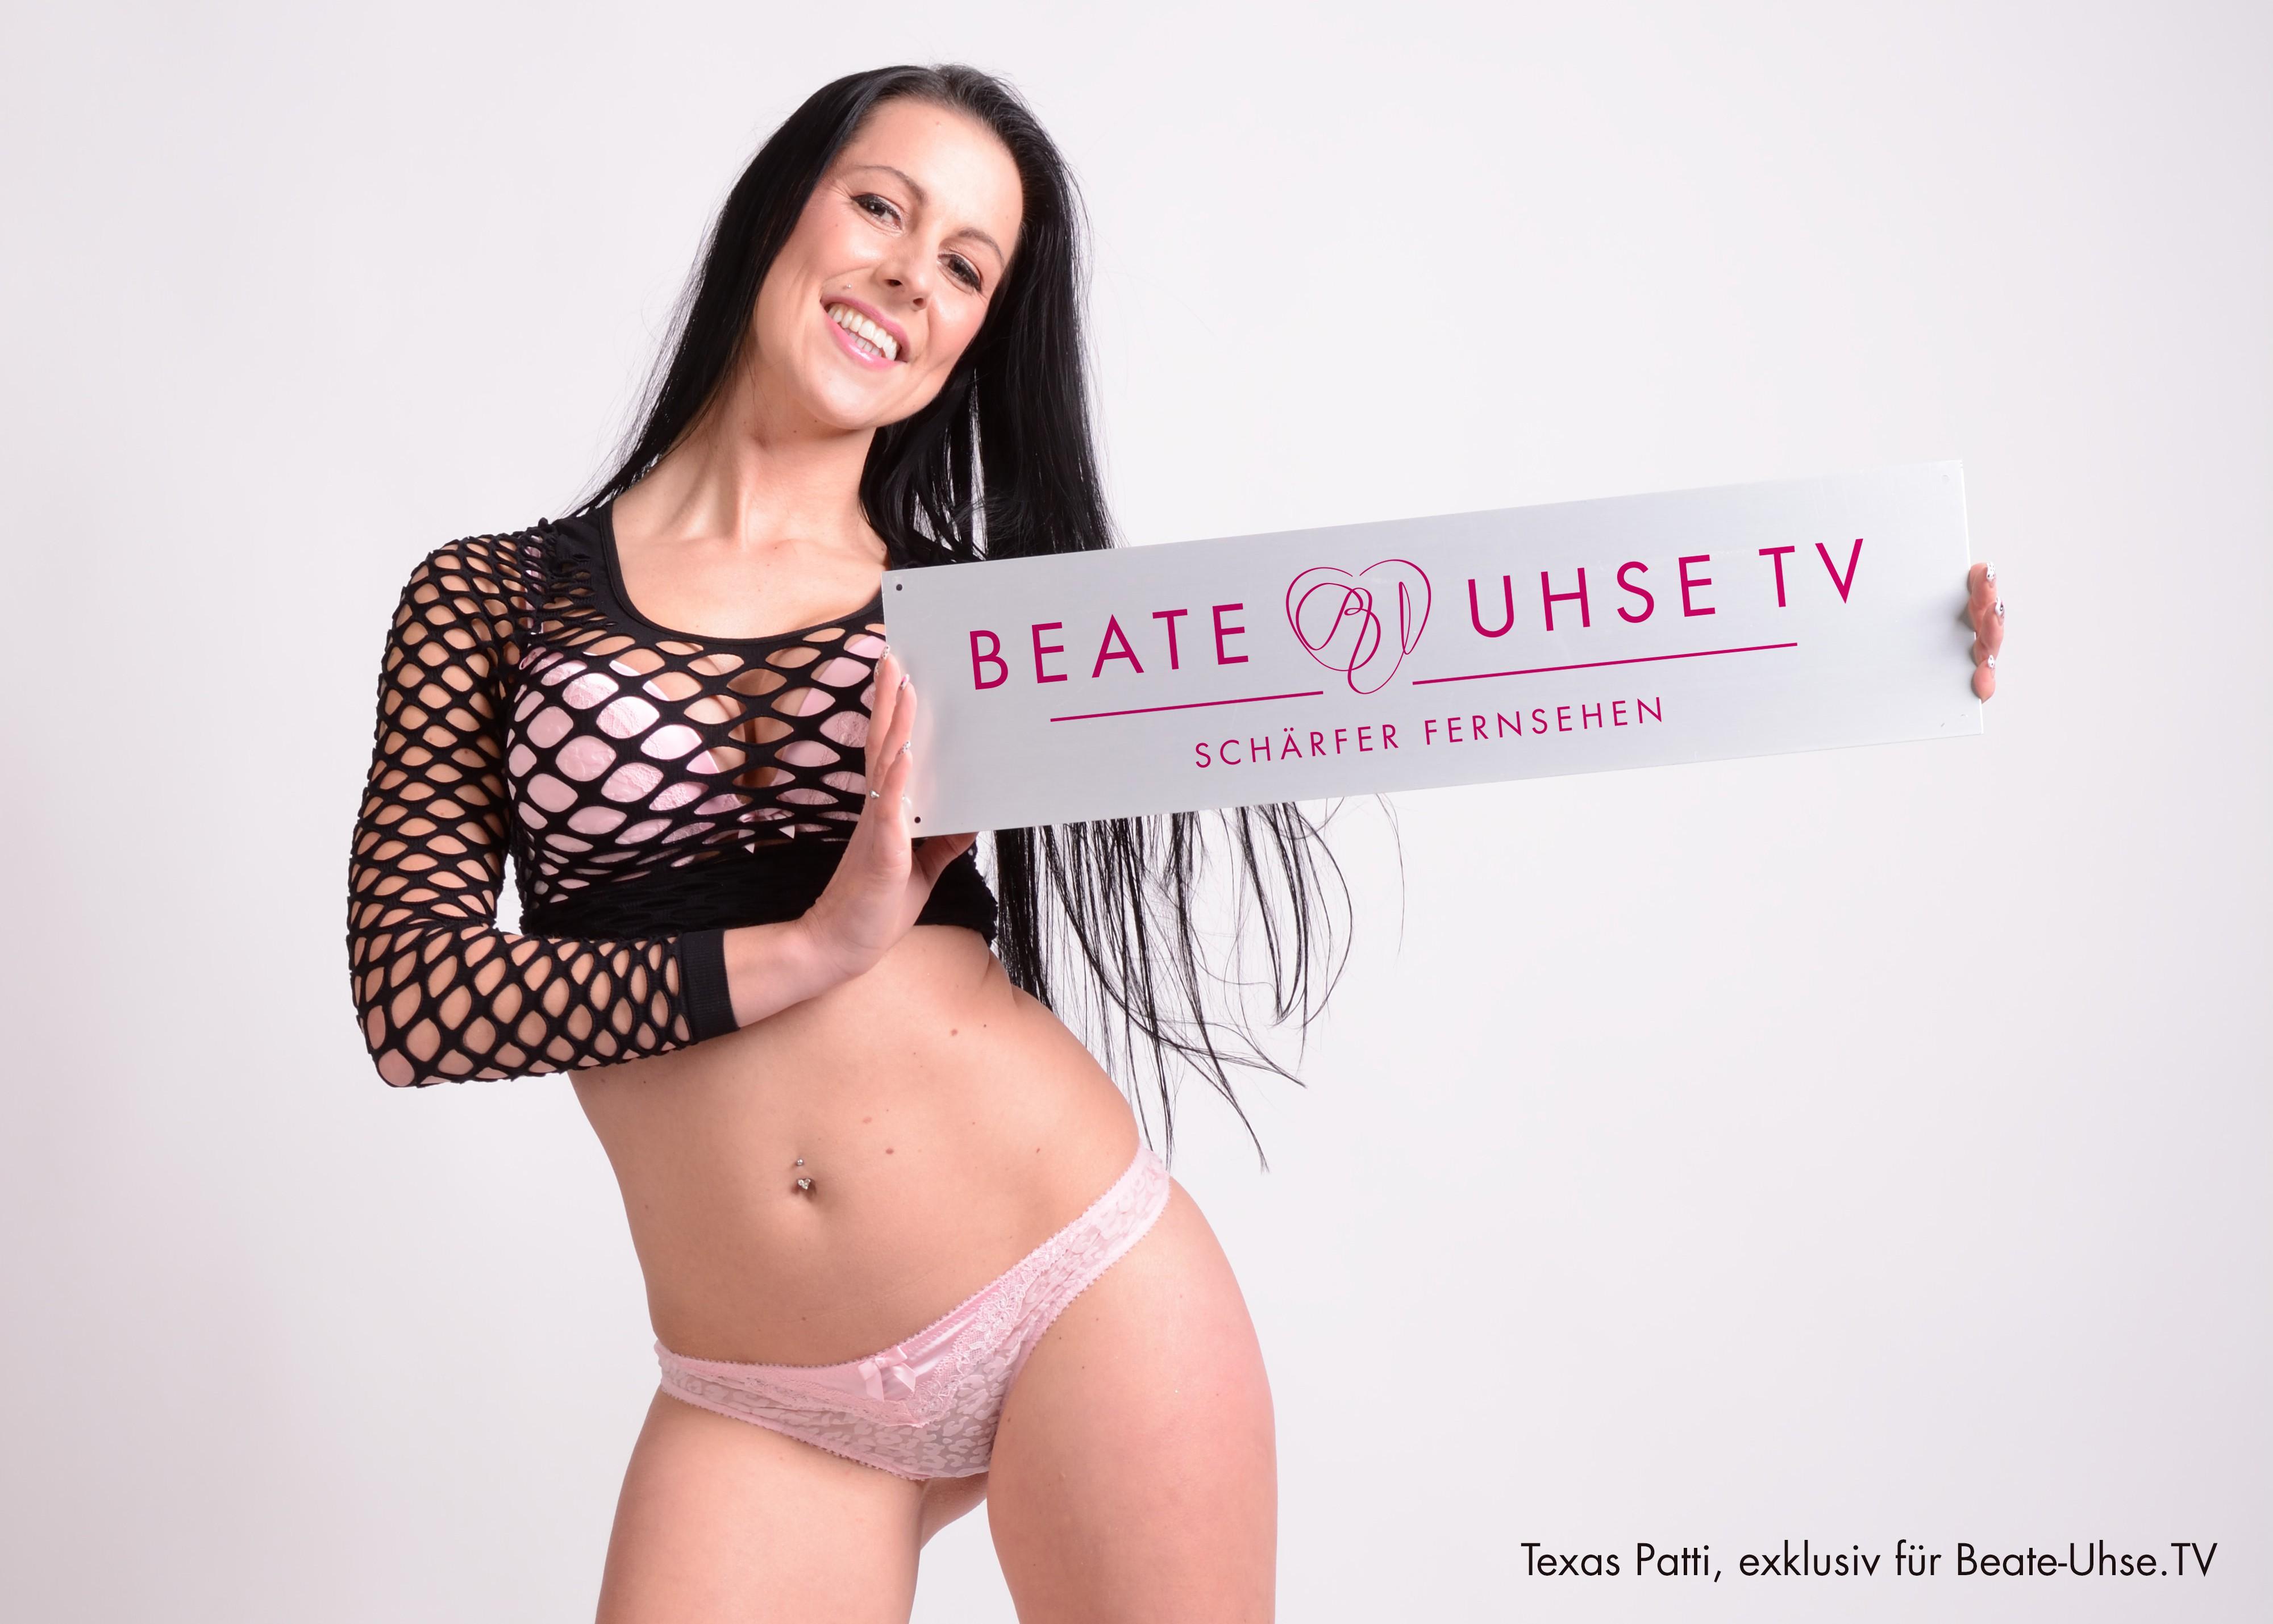 Beate Uhse Tv.De